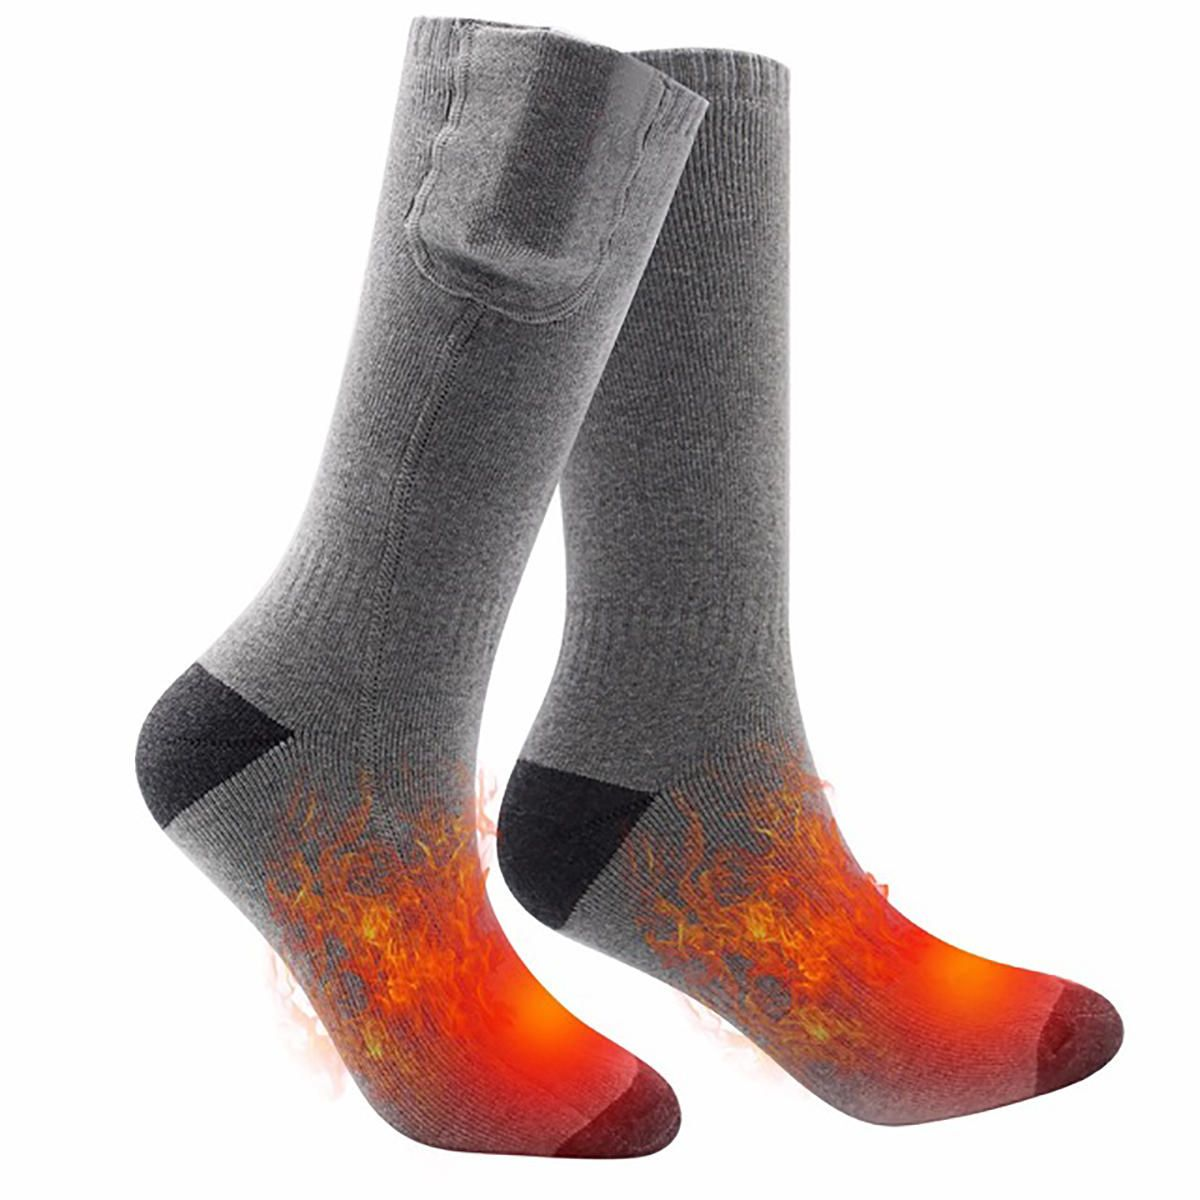 ETU US$44.38 Cotton Electric Rechargeable Battery Heated Socks Winter Cycling Ski Warmer Feet Socks